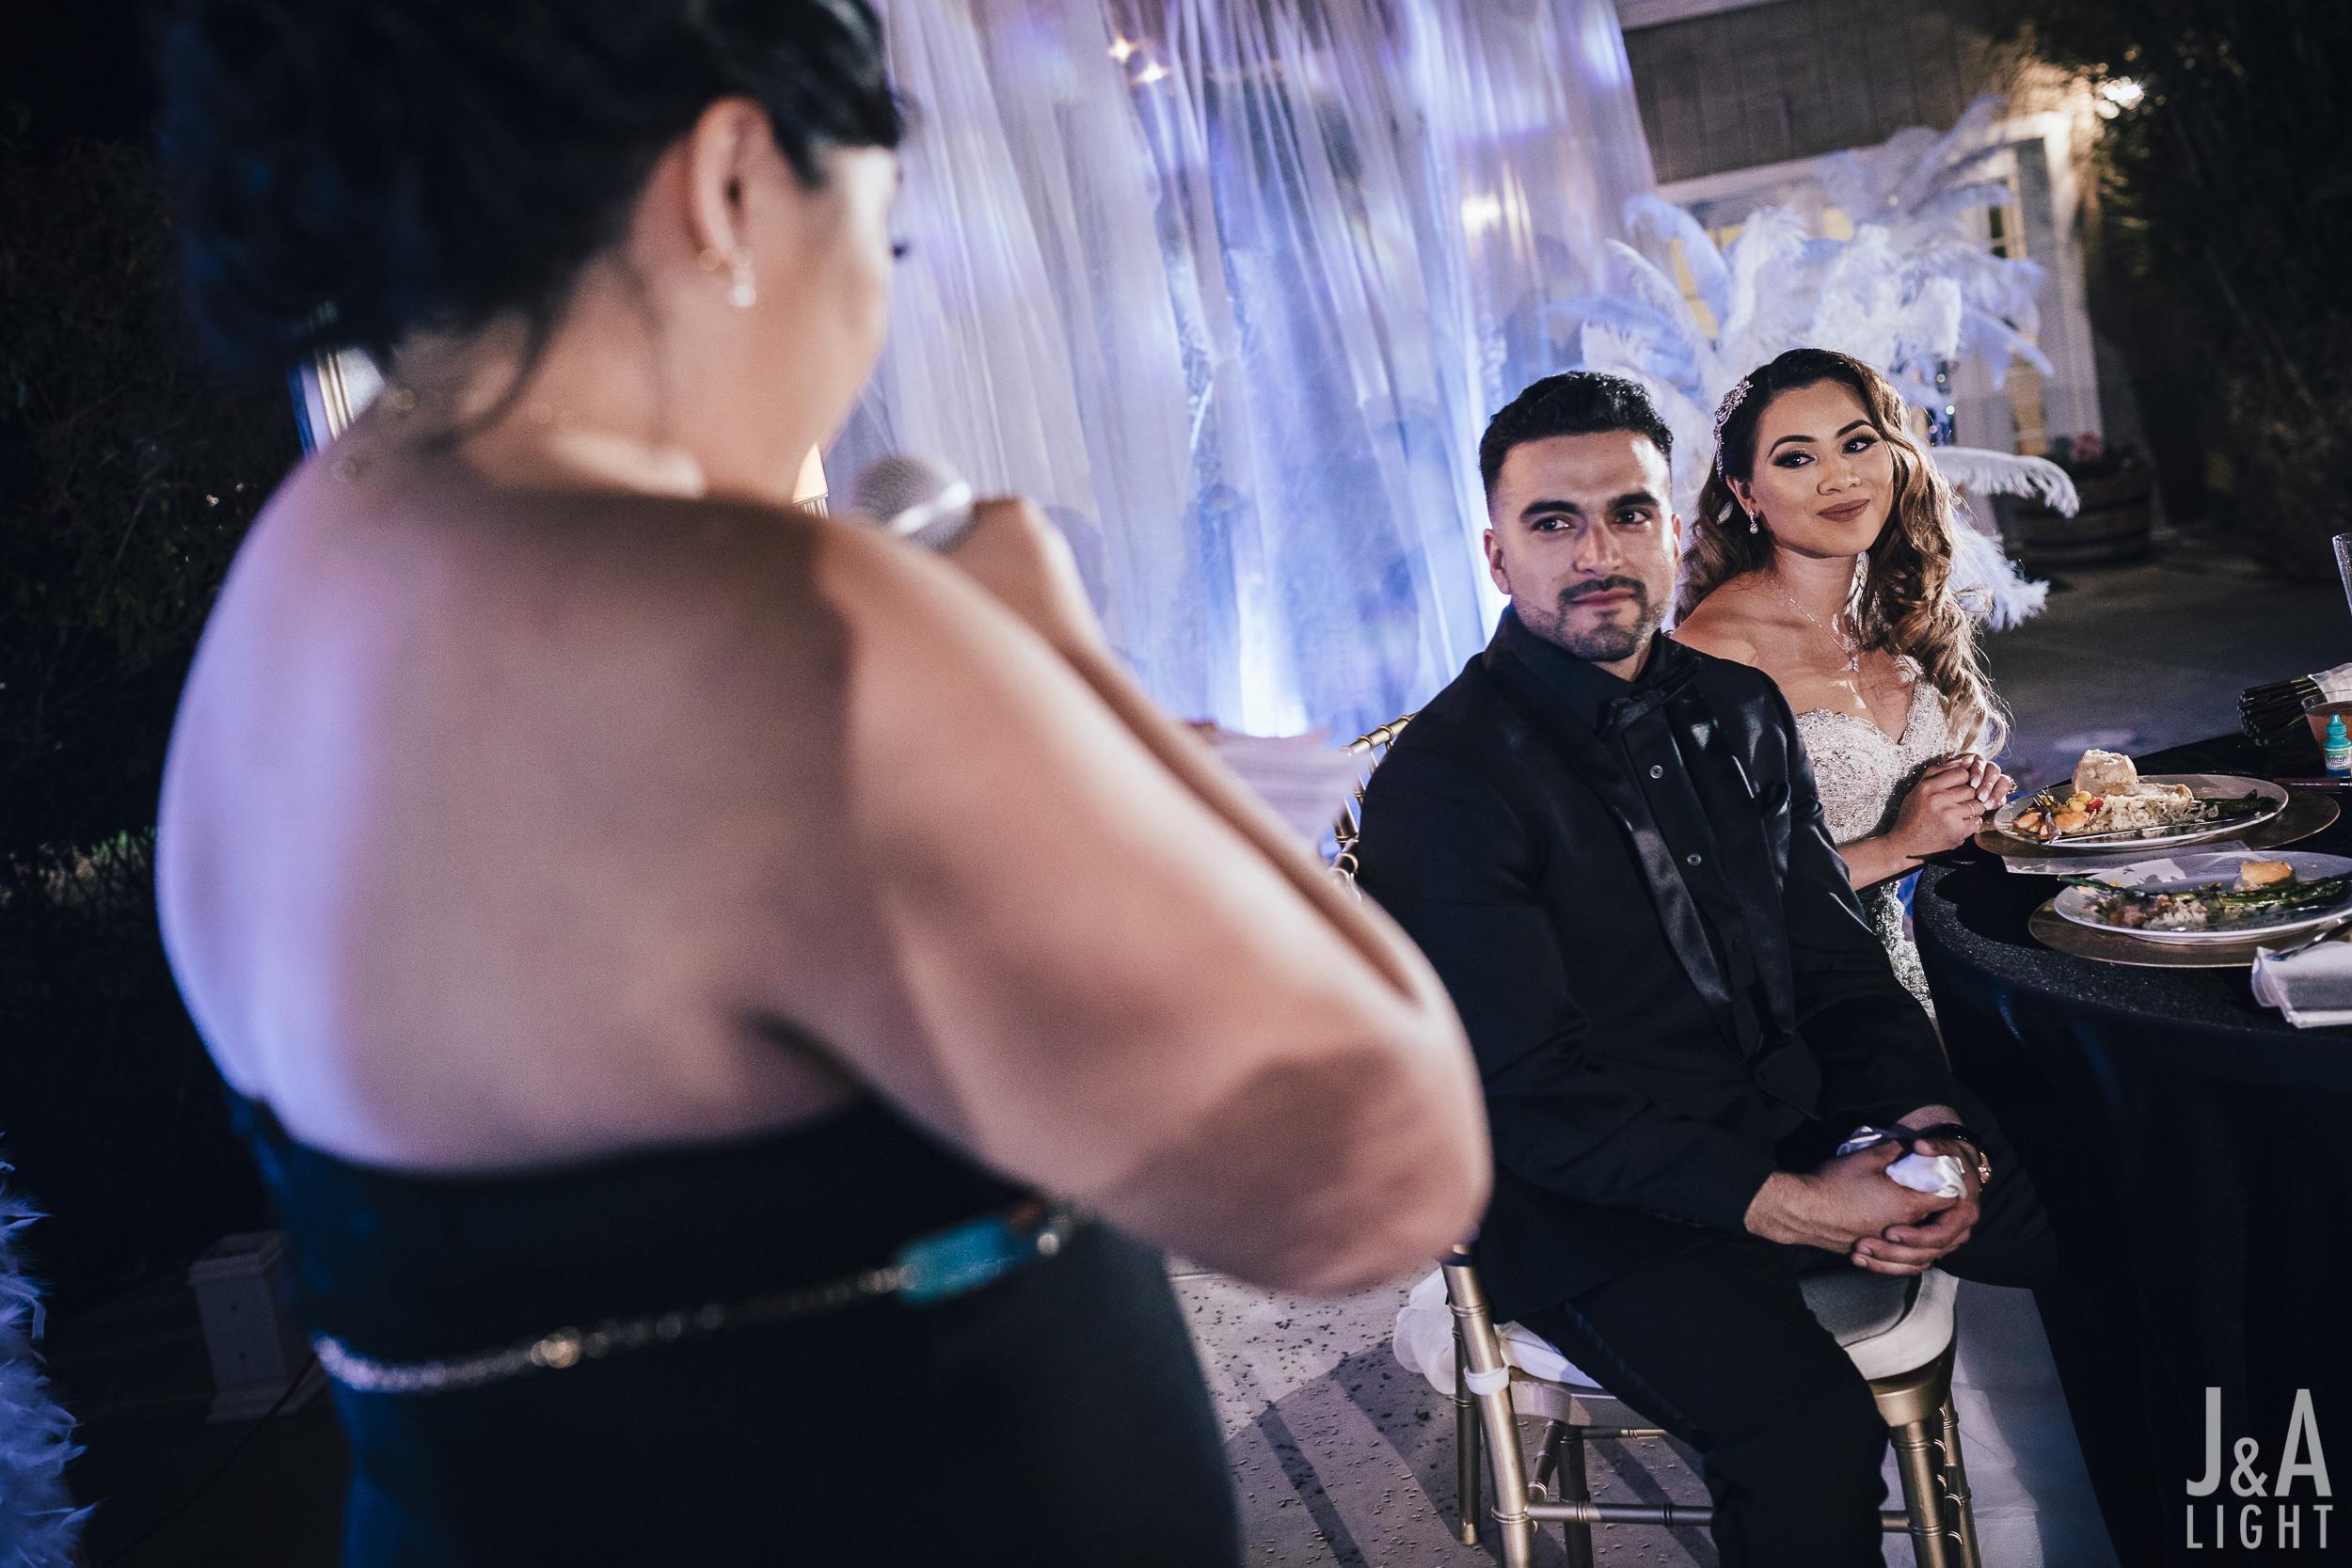 20171014-JanDan-LosBanos-GlassMansion-Wedding-Blog-075.jpg